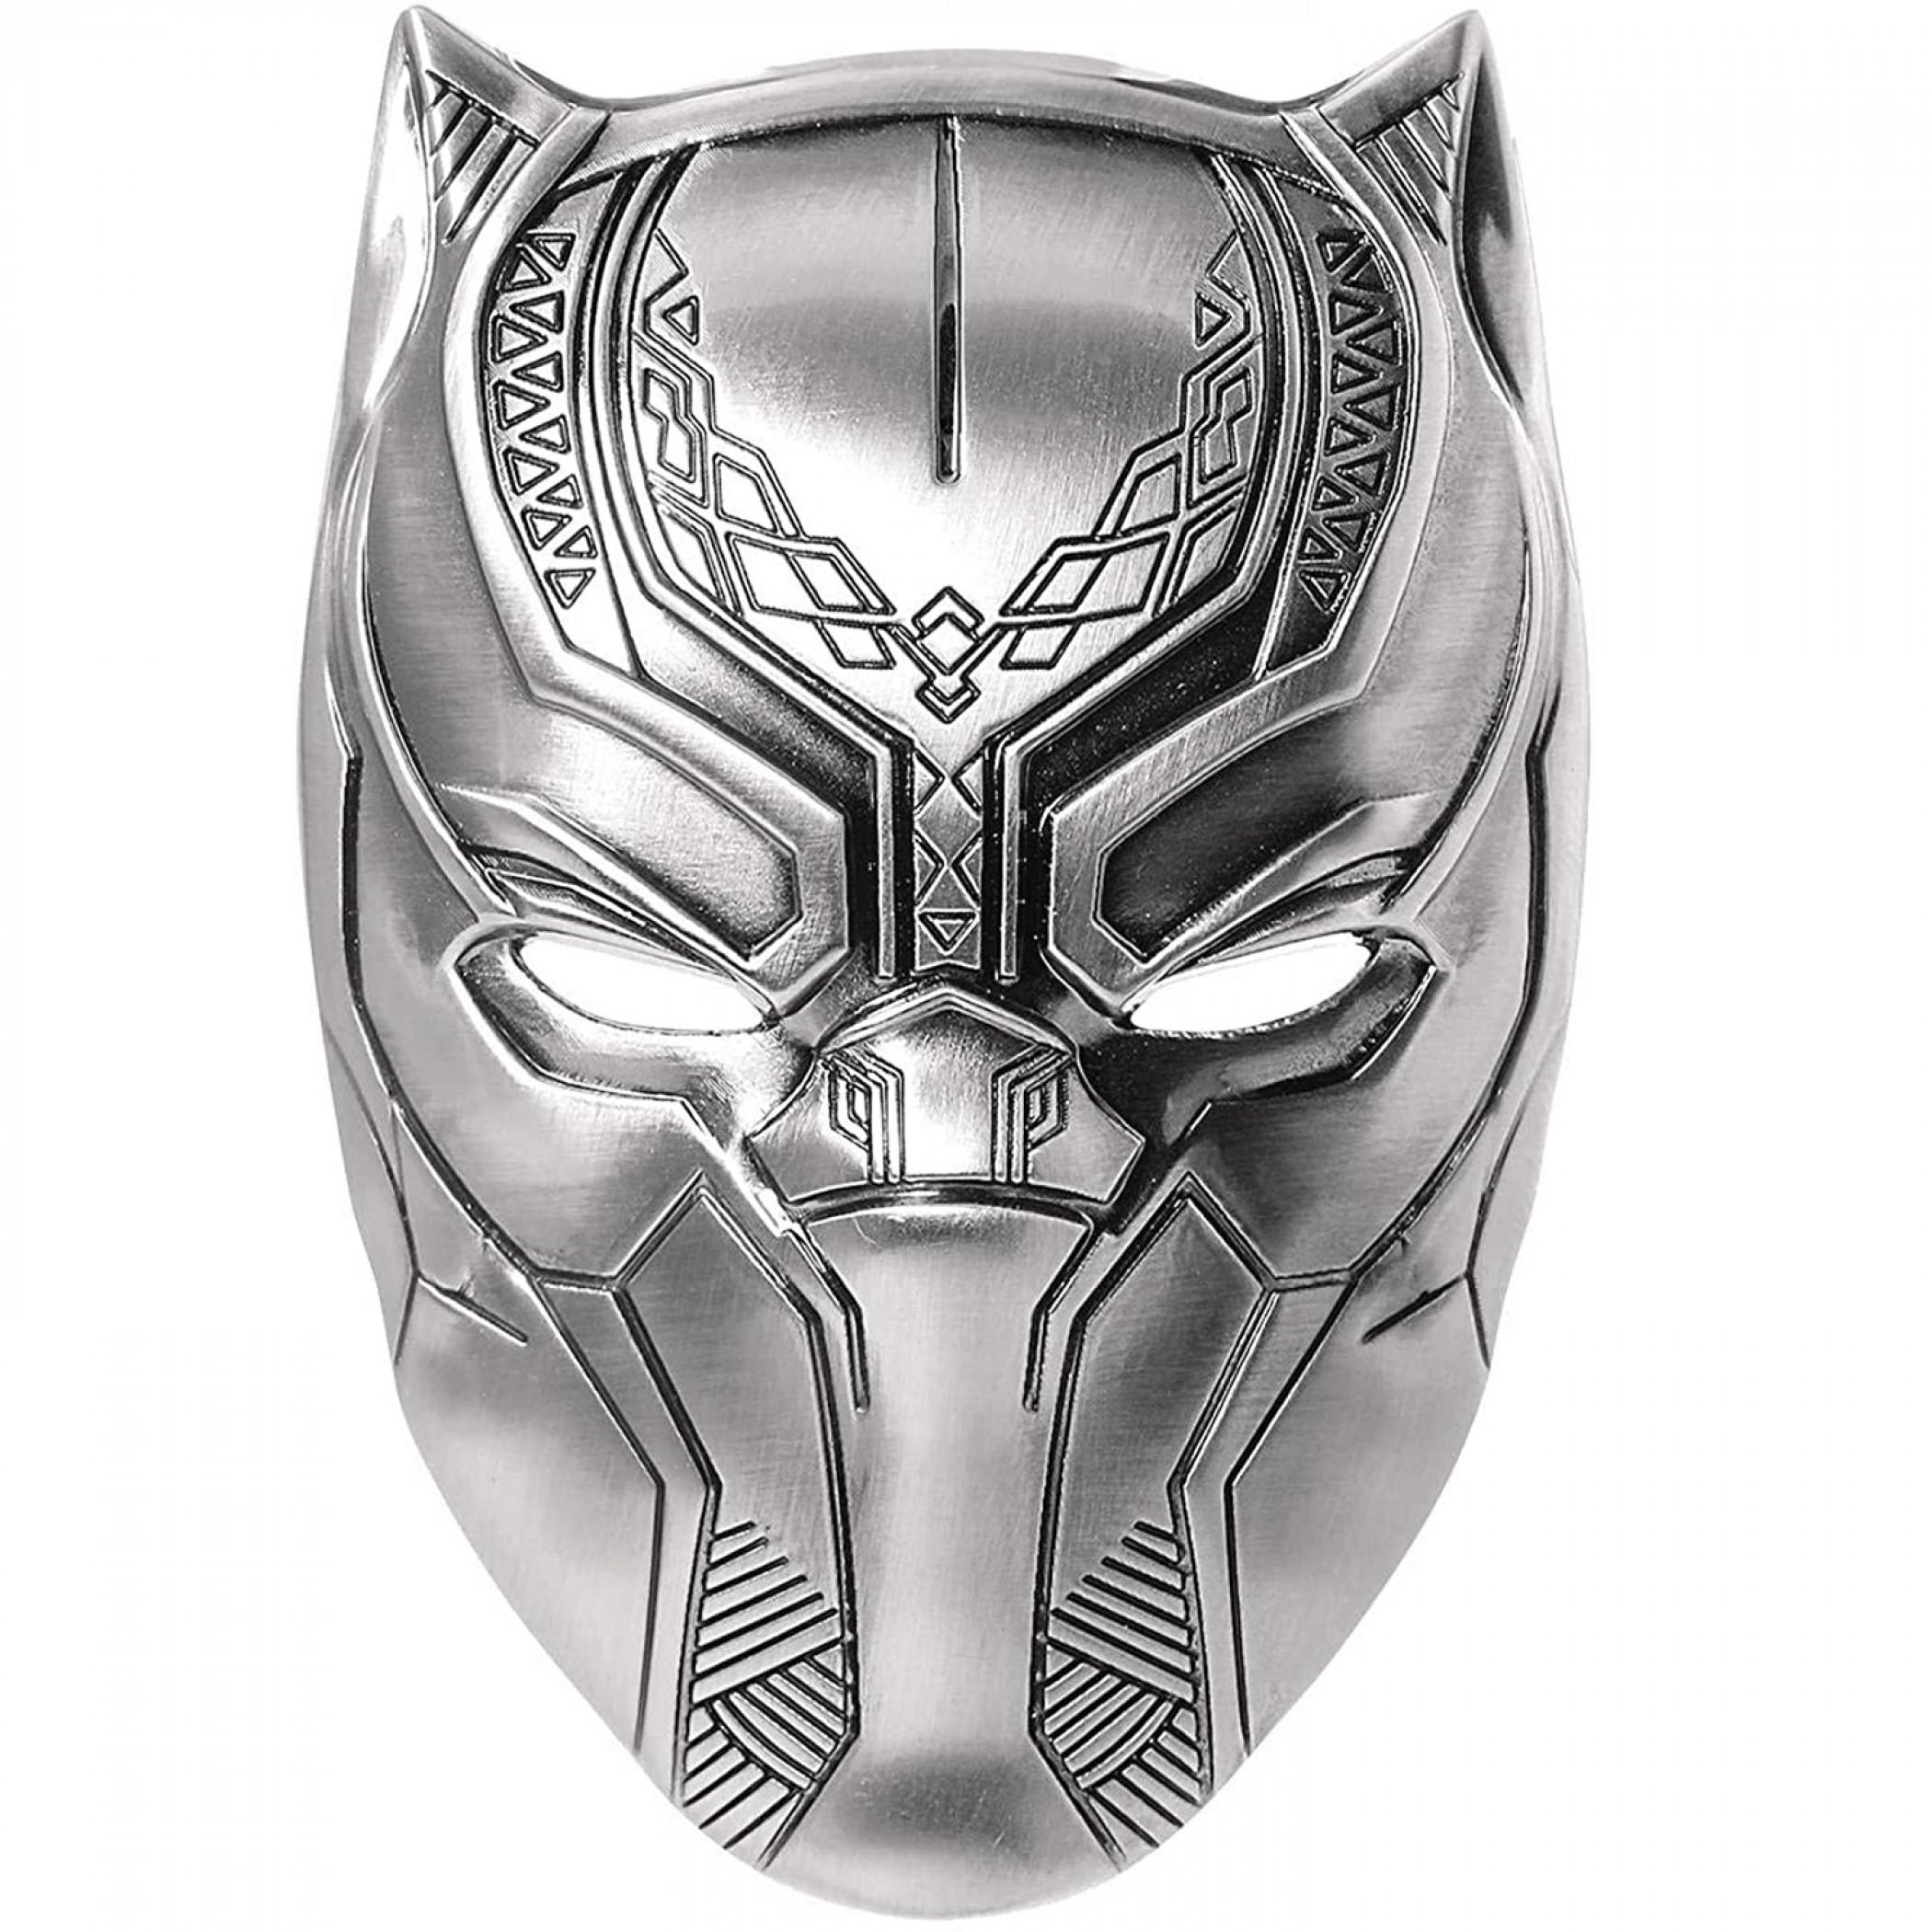 Marvel Black Panther Helmet Pewter Lapel Pin